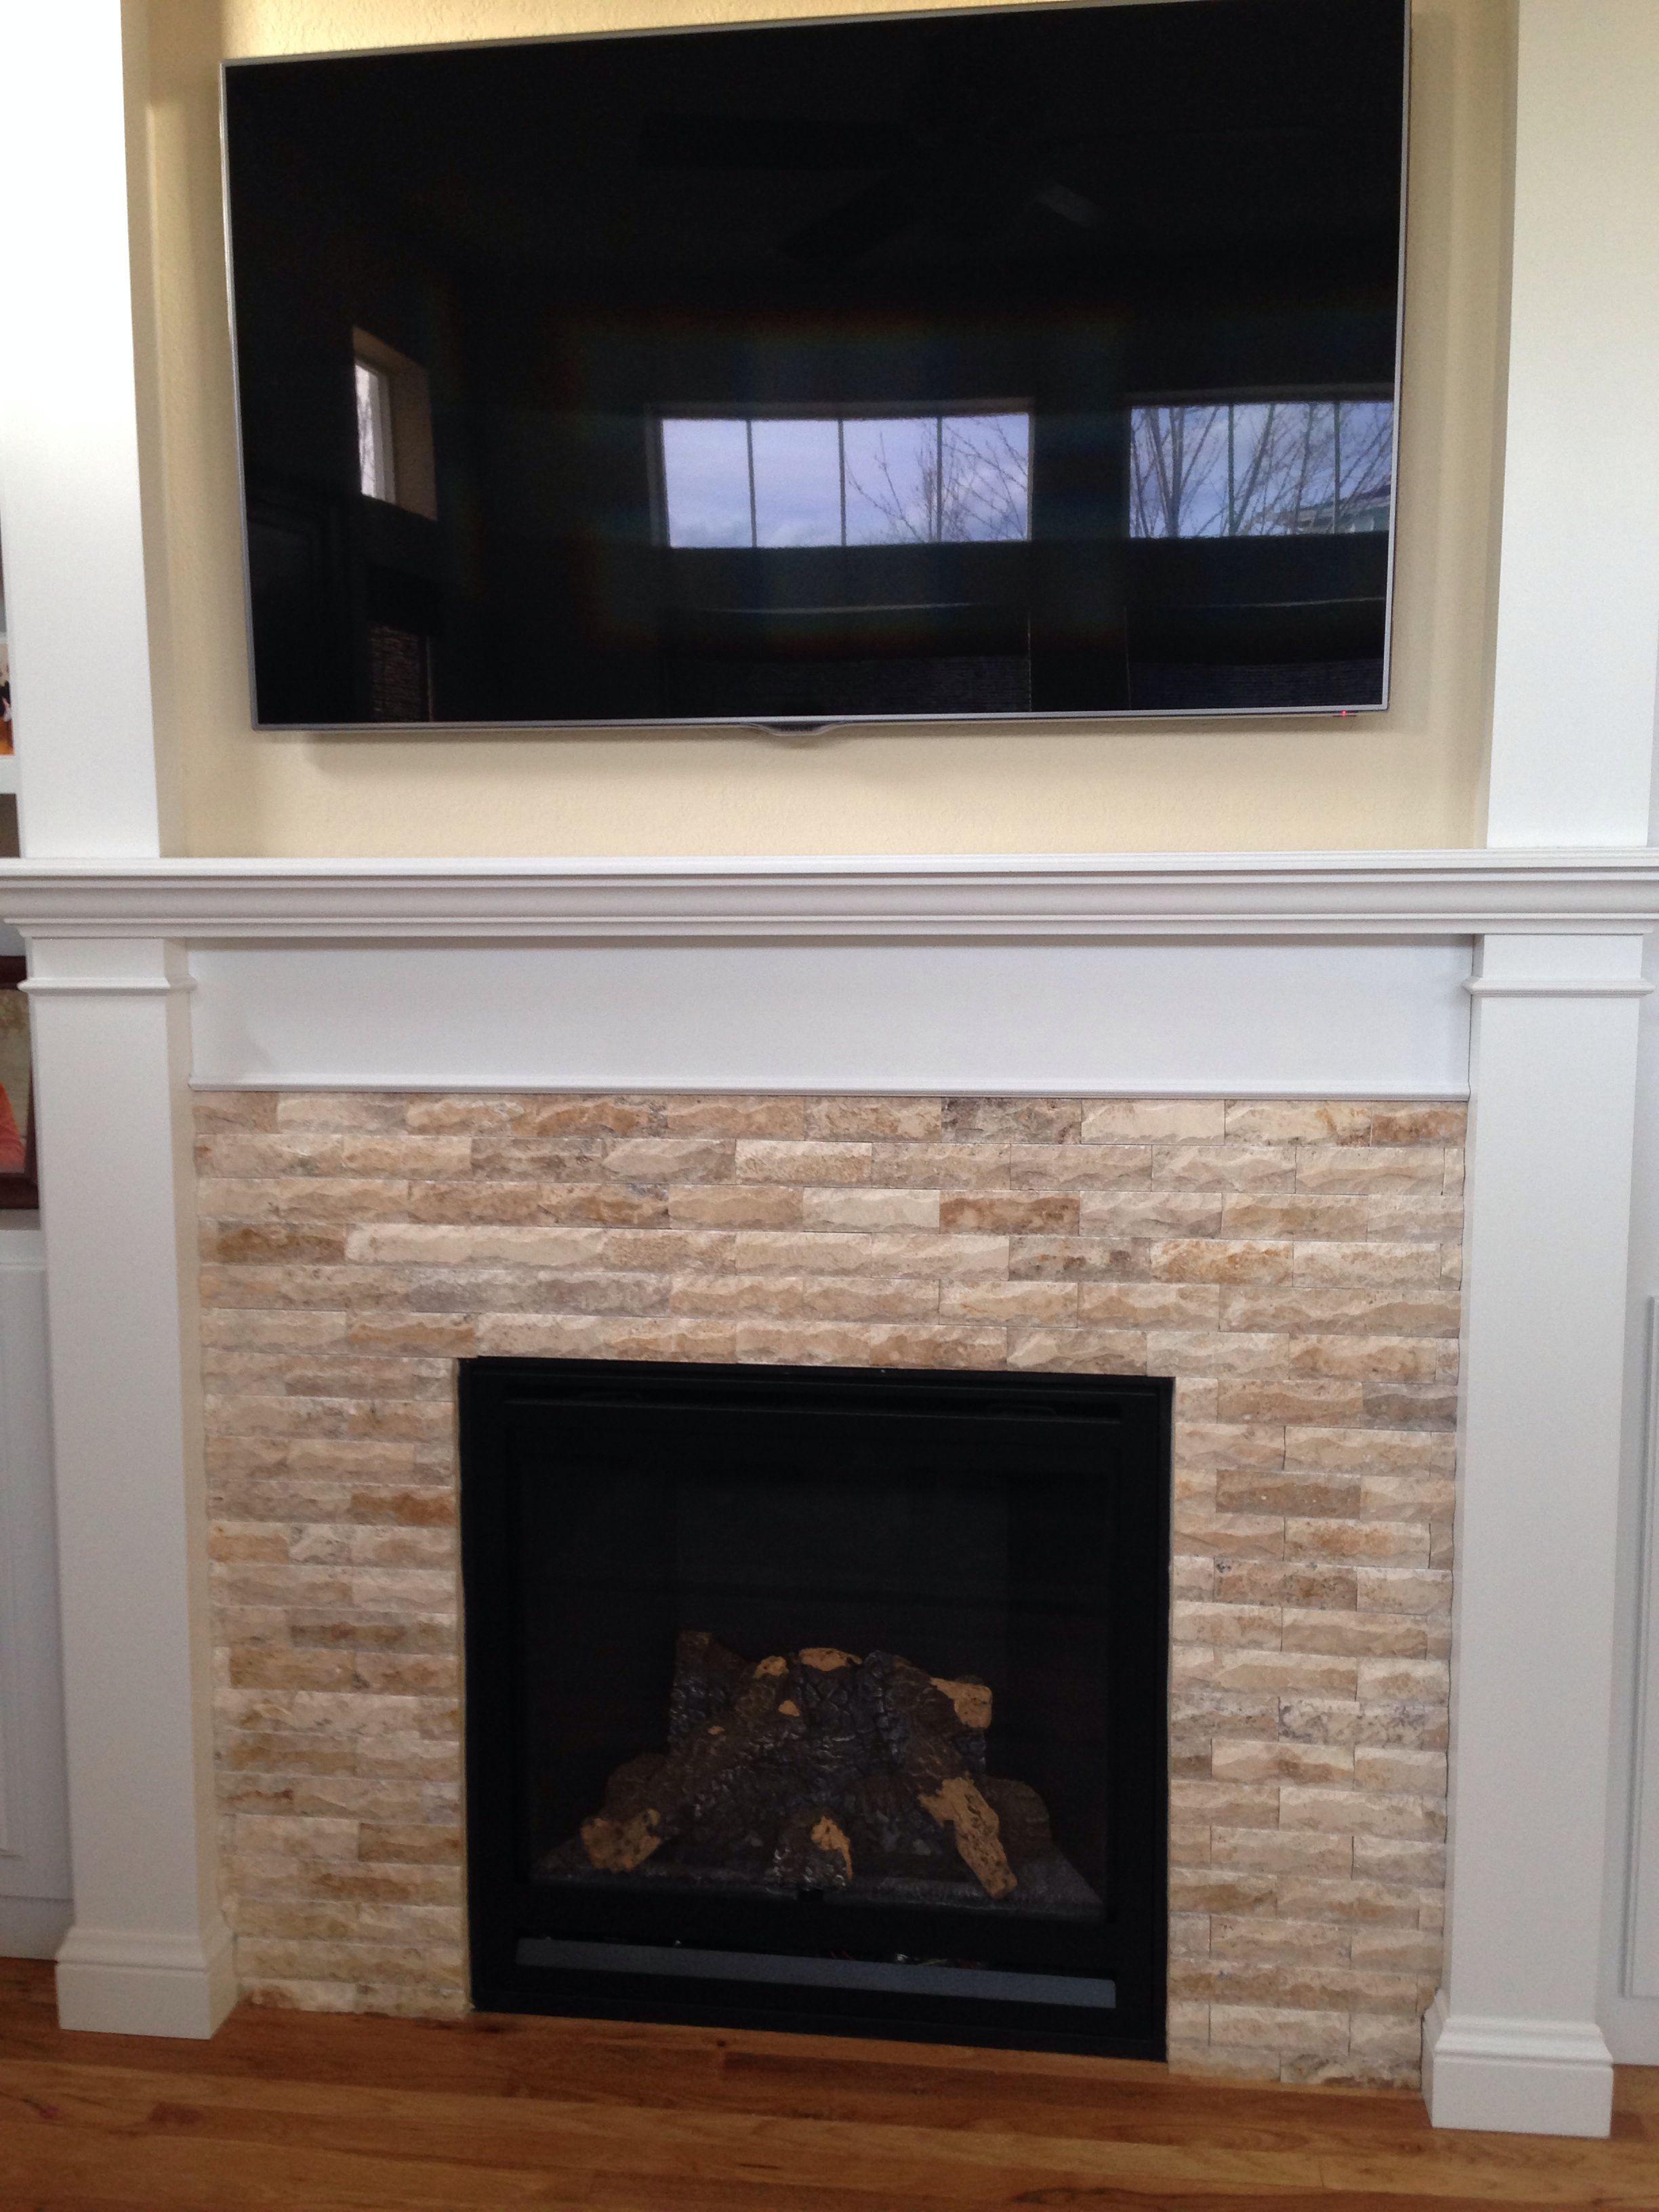 Fire place stone | Fireplace redo, Fireplace mantels, House